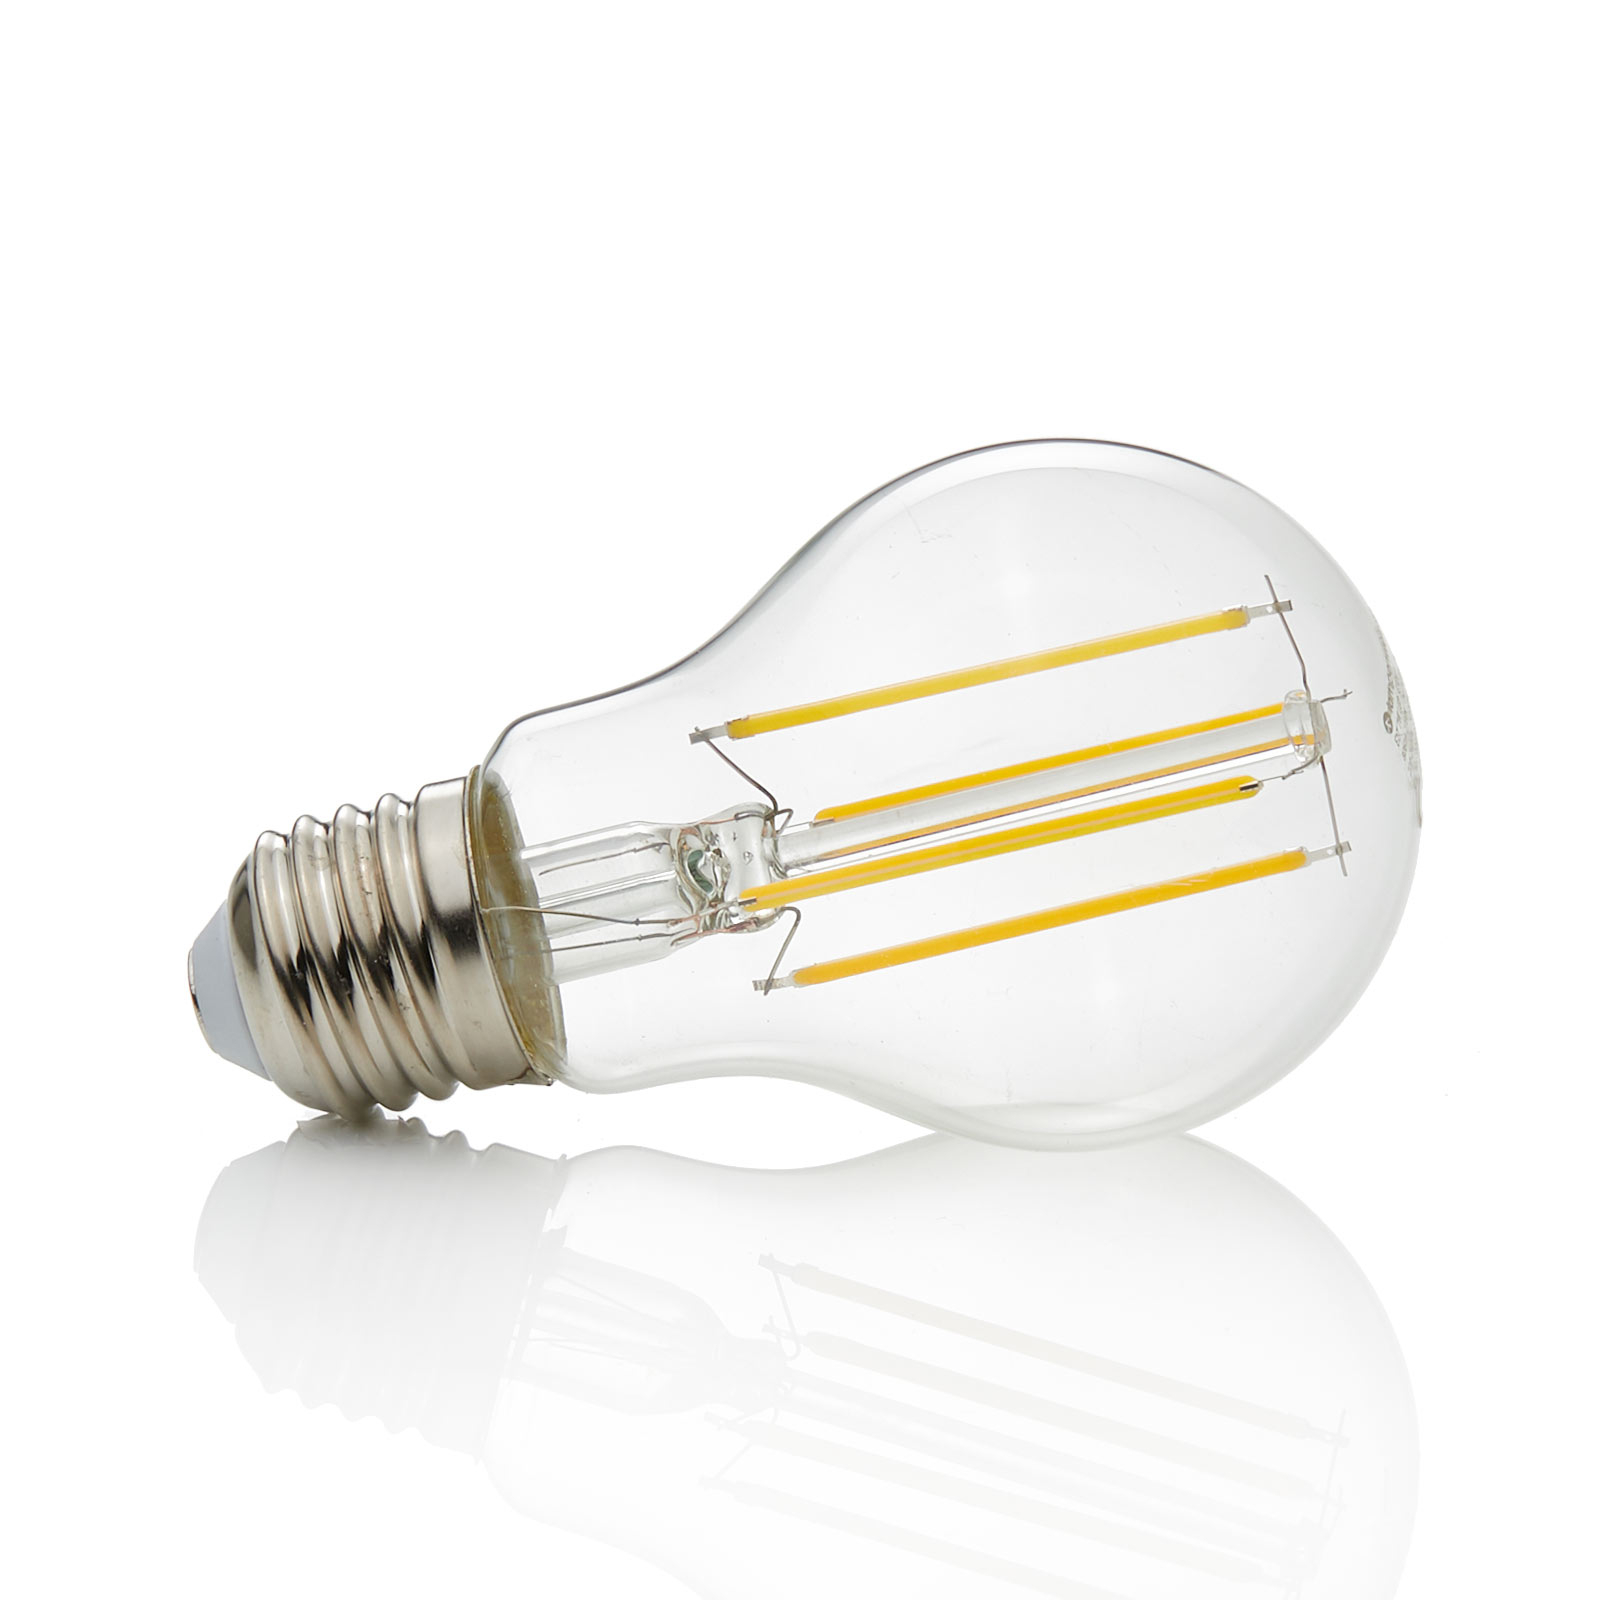 Flamme LED E27 7W, 806lm, 2700K, transparent